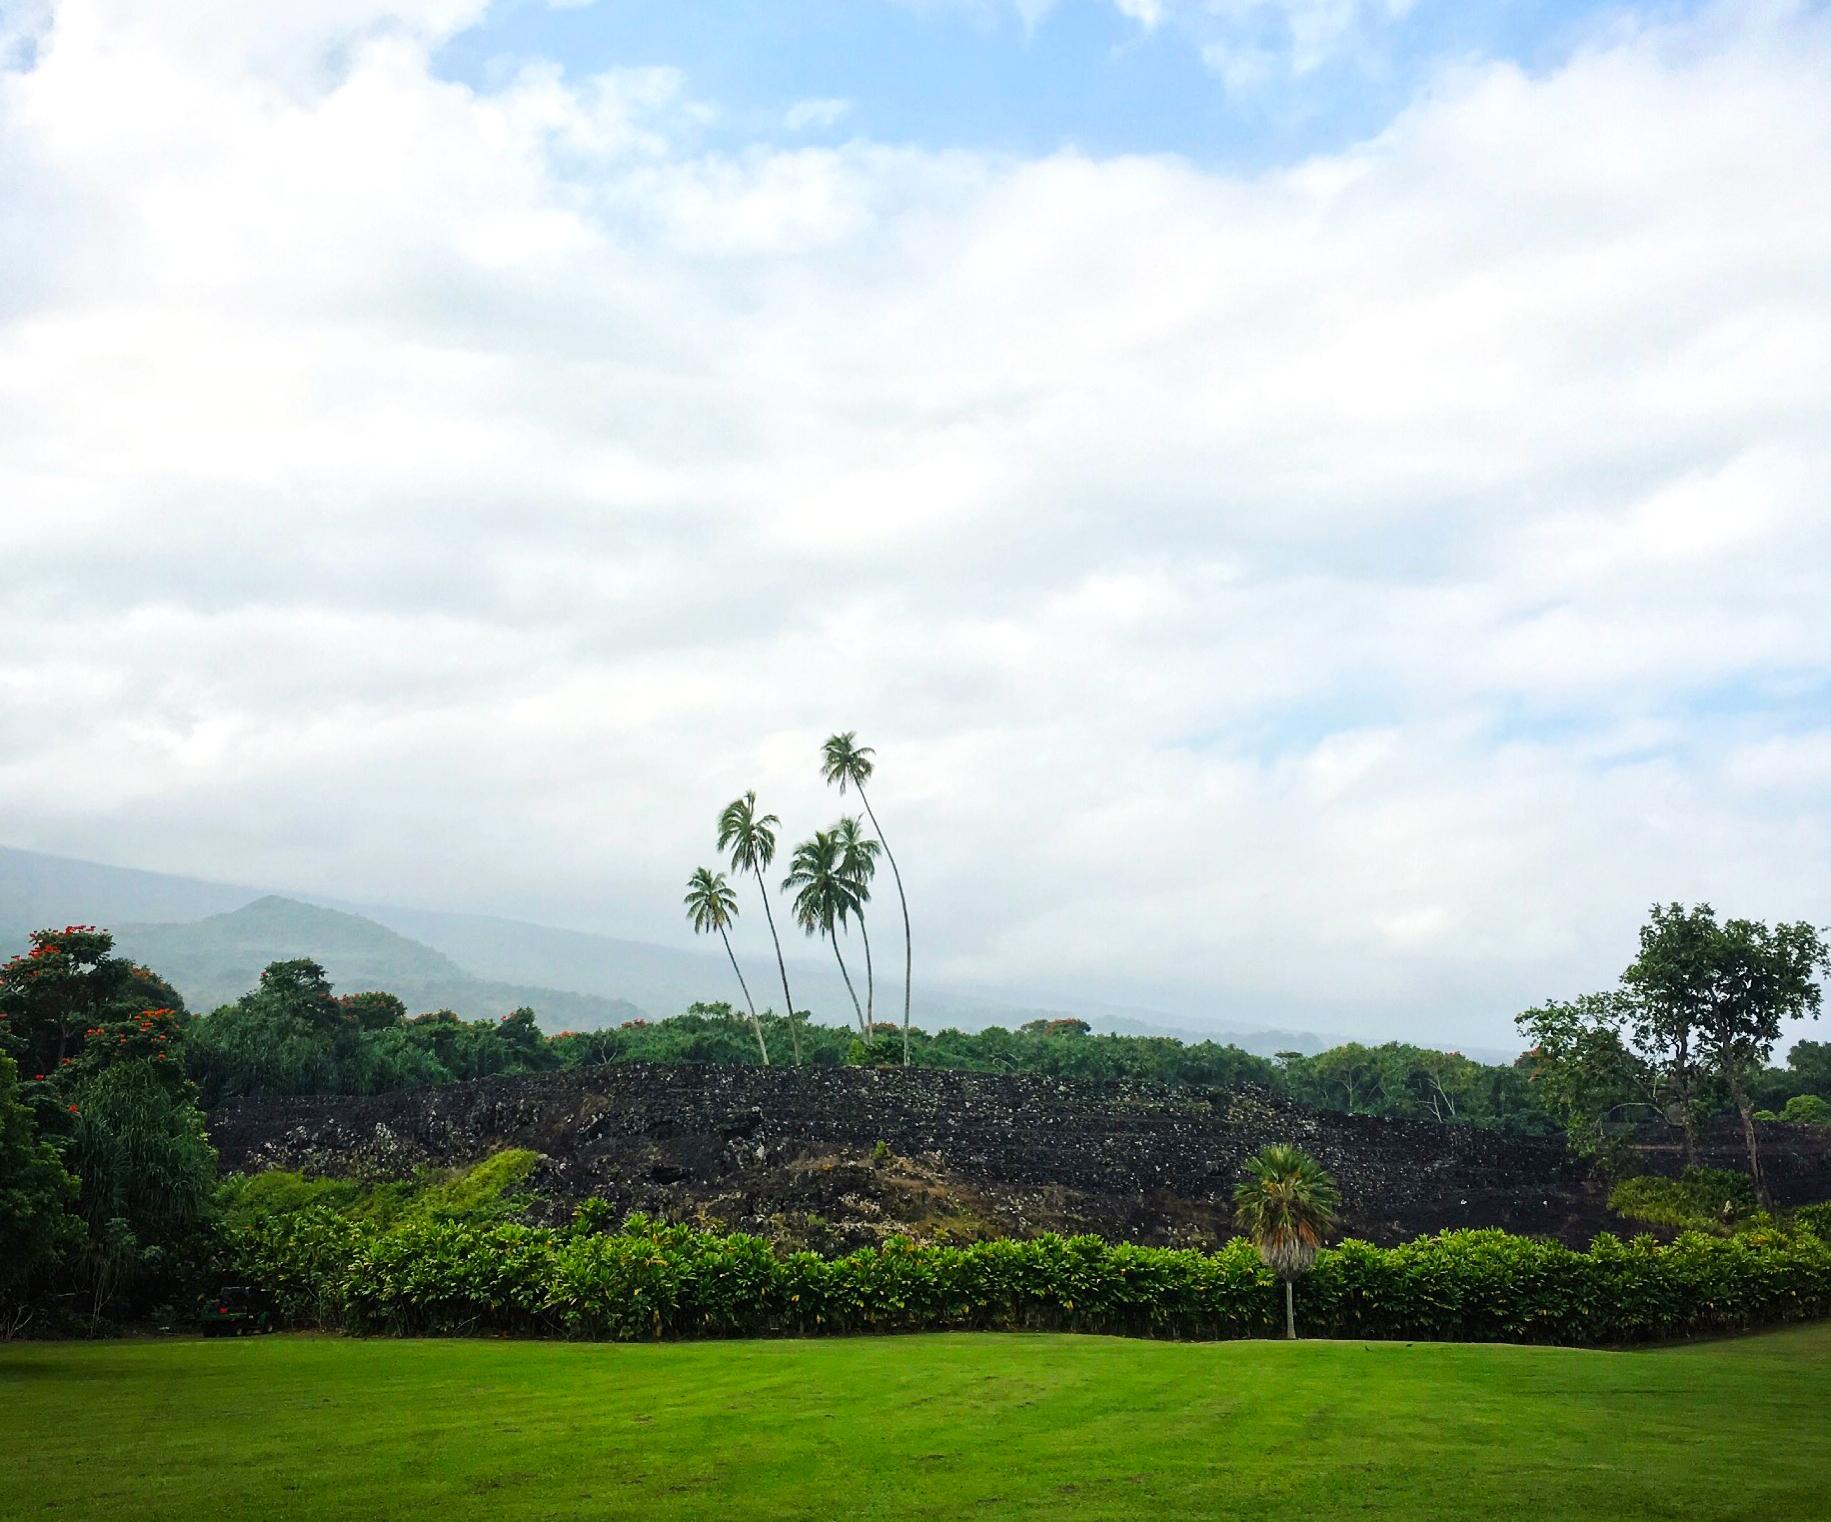 At Pi'ilanihale Heiau in Hana, Maui